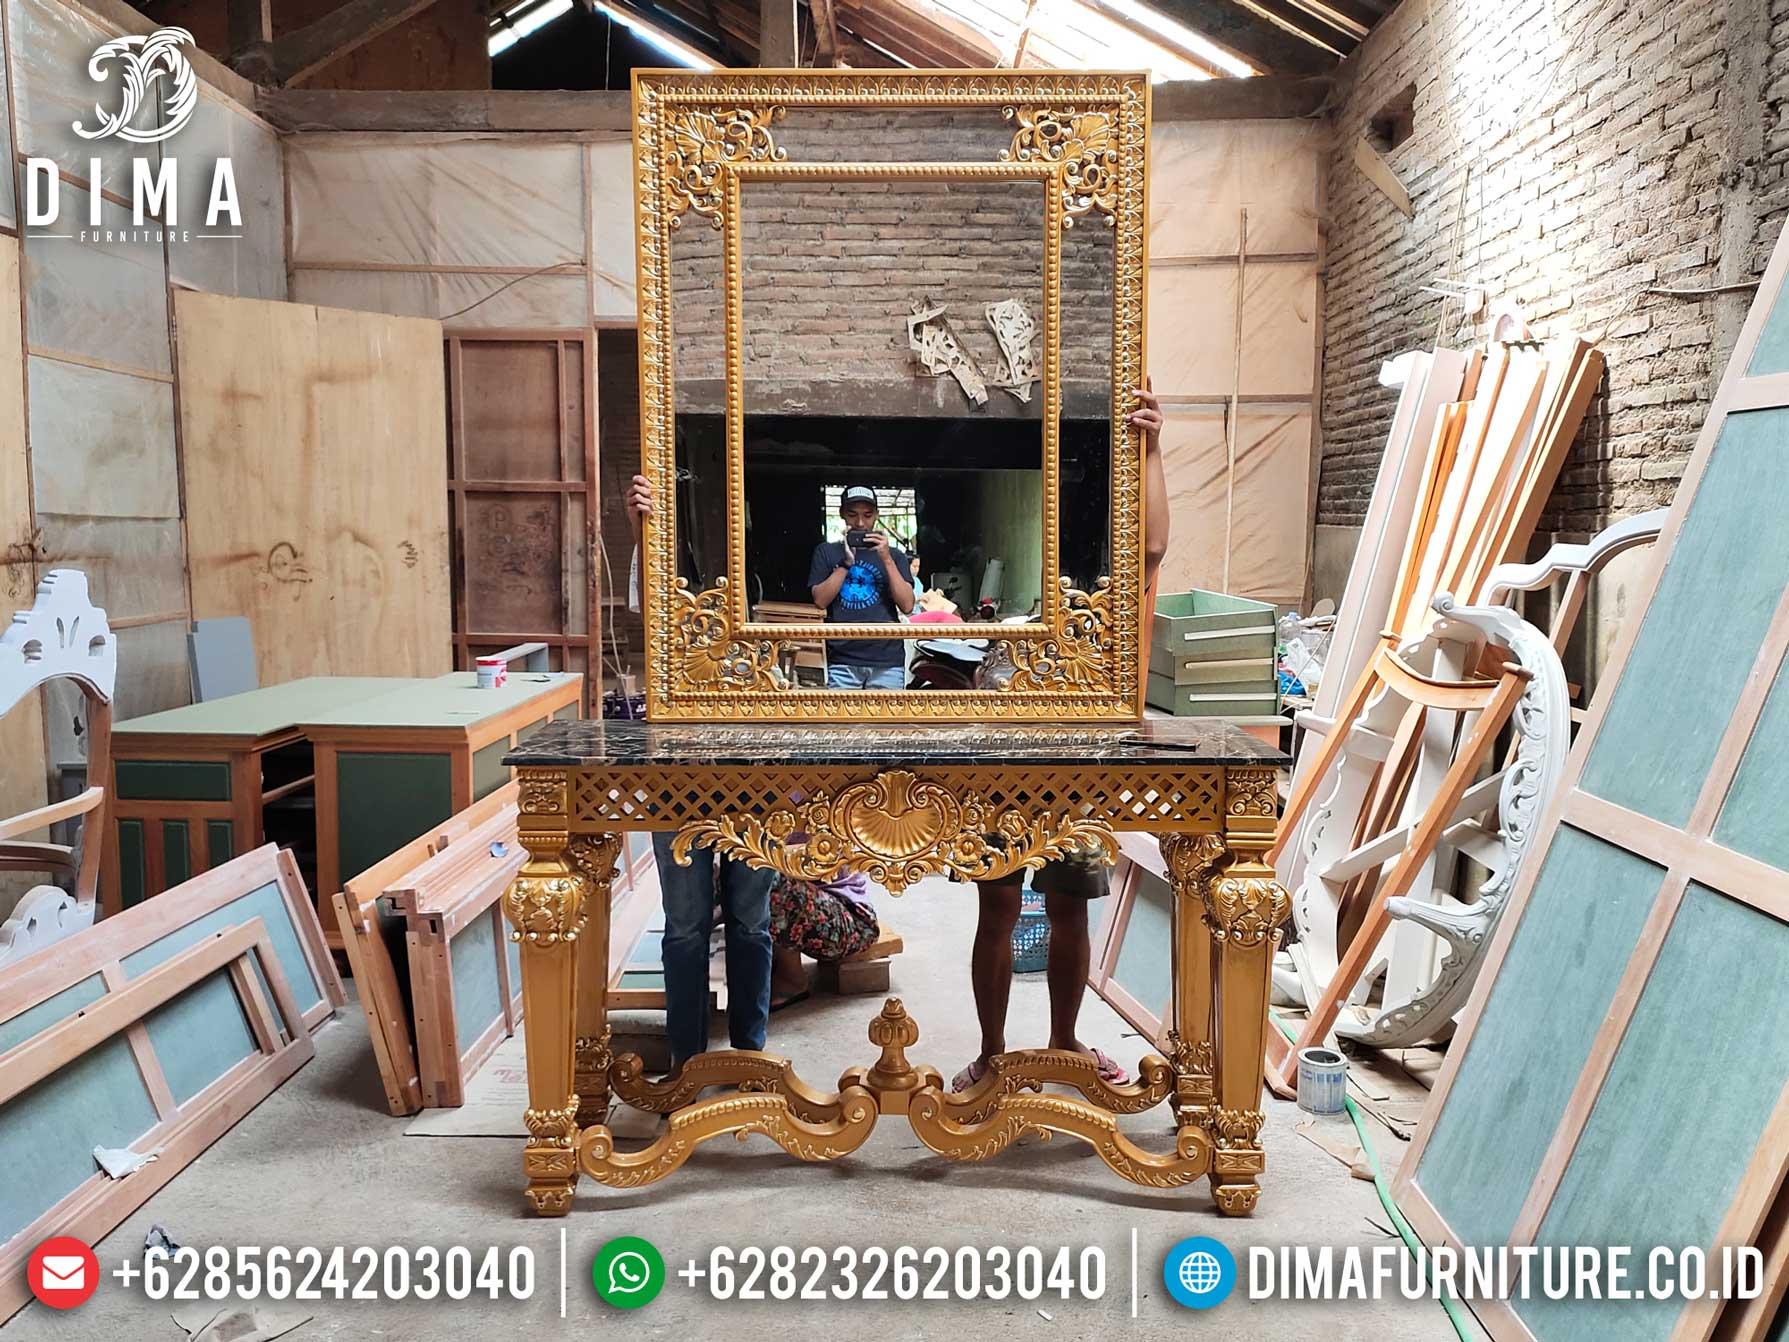 Jual Meja Konsol Mewah Ukiran Jepara Luxury Classic High Quality Color ST-1023